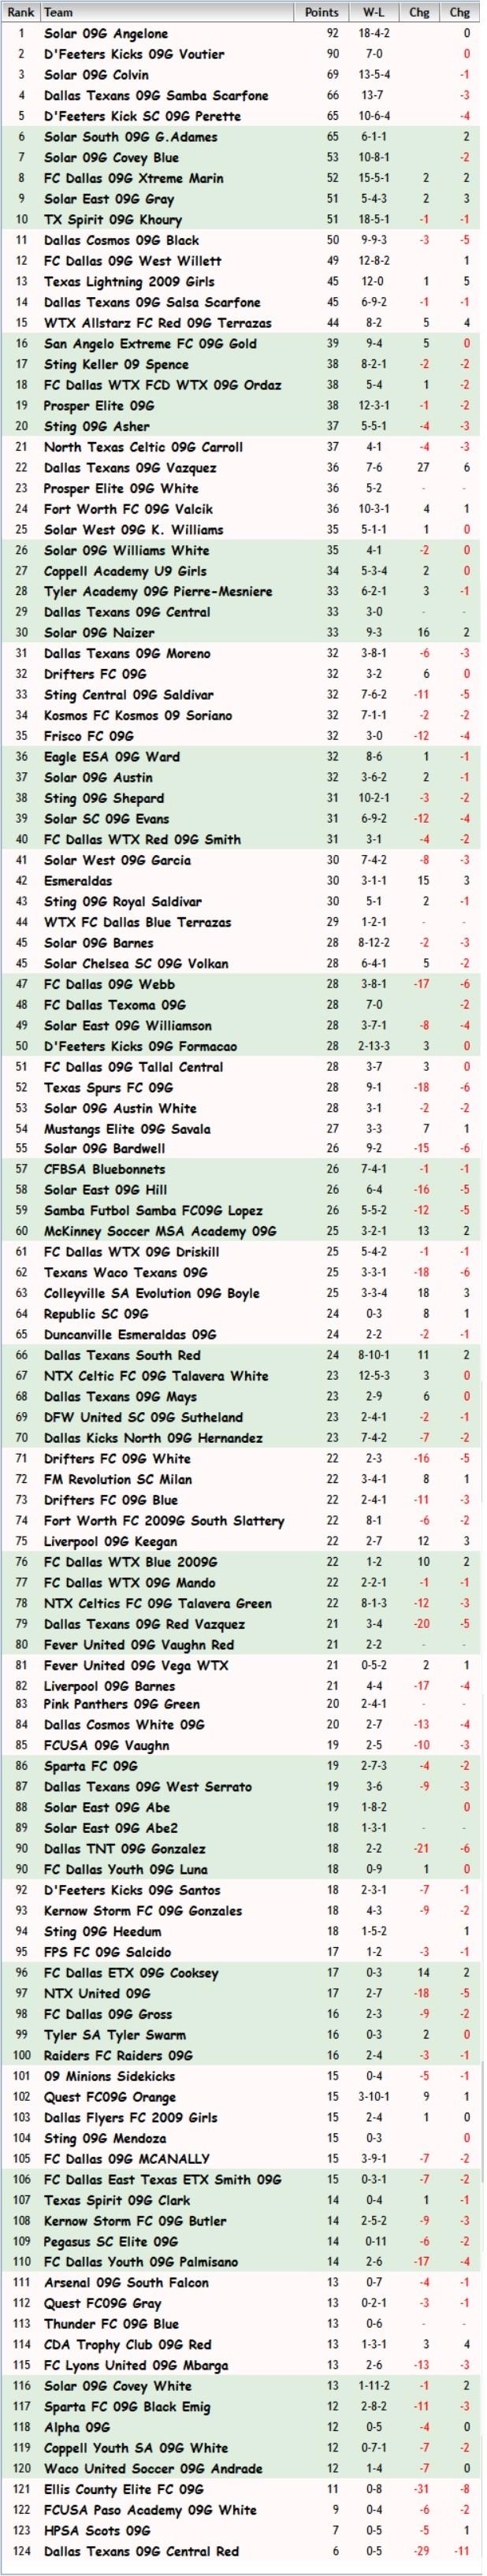 FBR09 Rankings November 20th, 2018 Fbr09_22